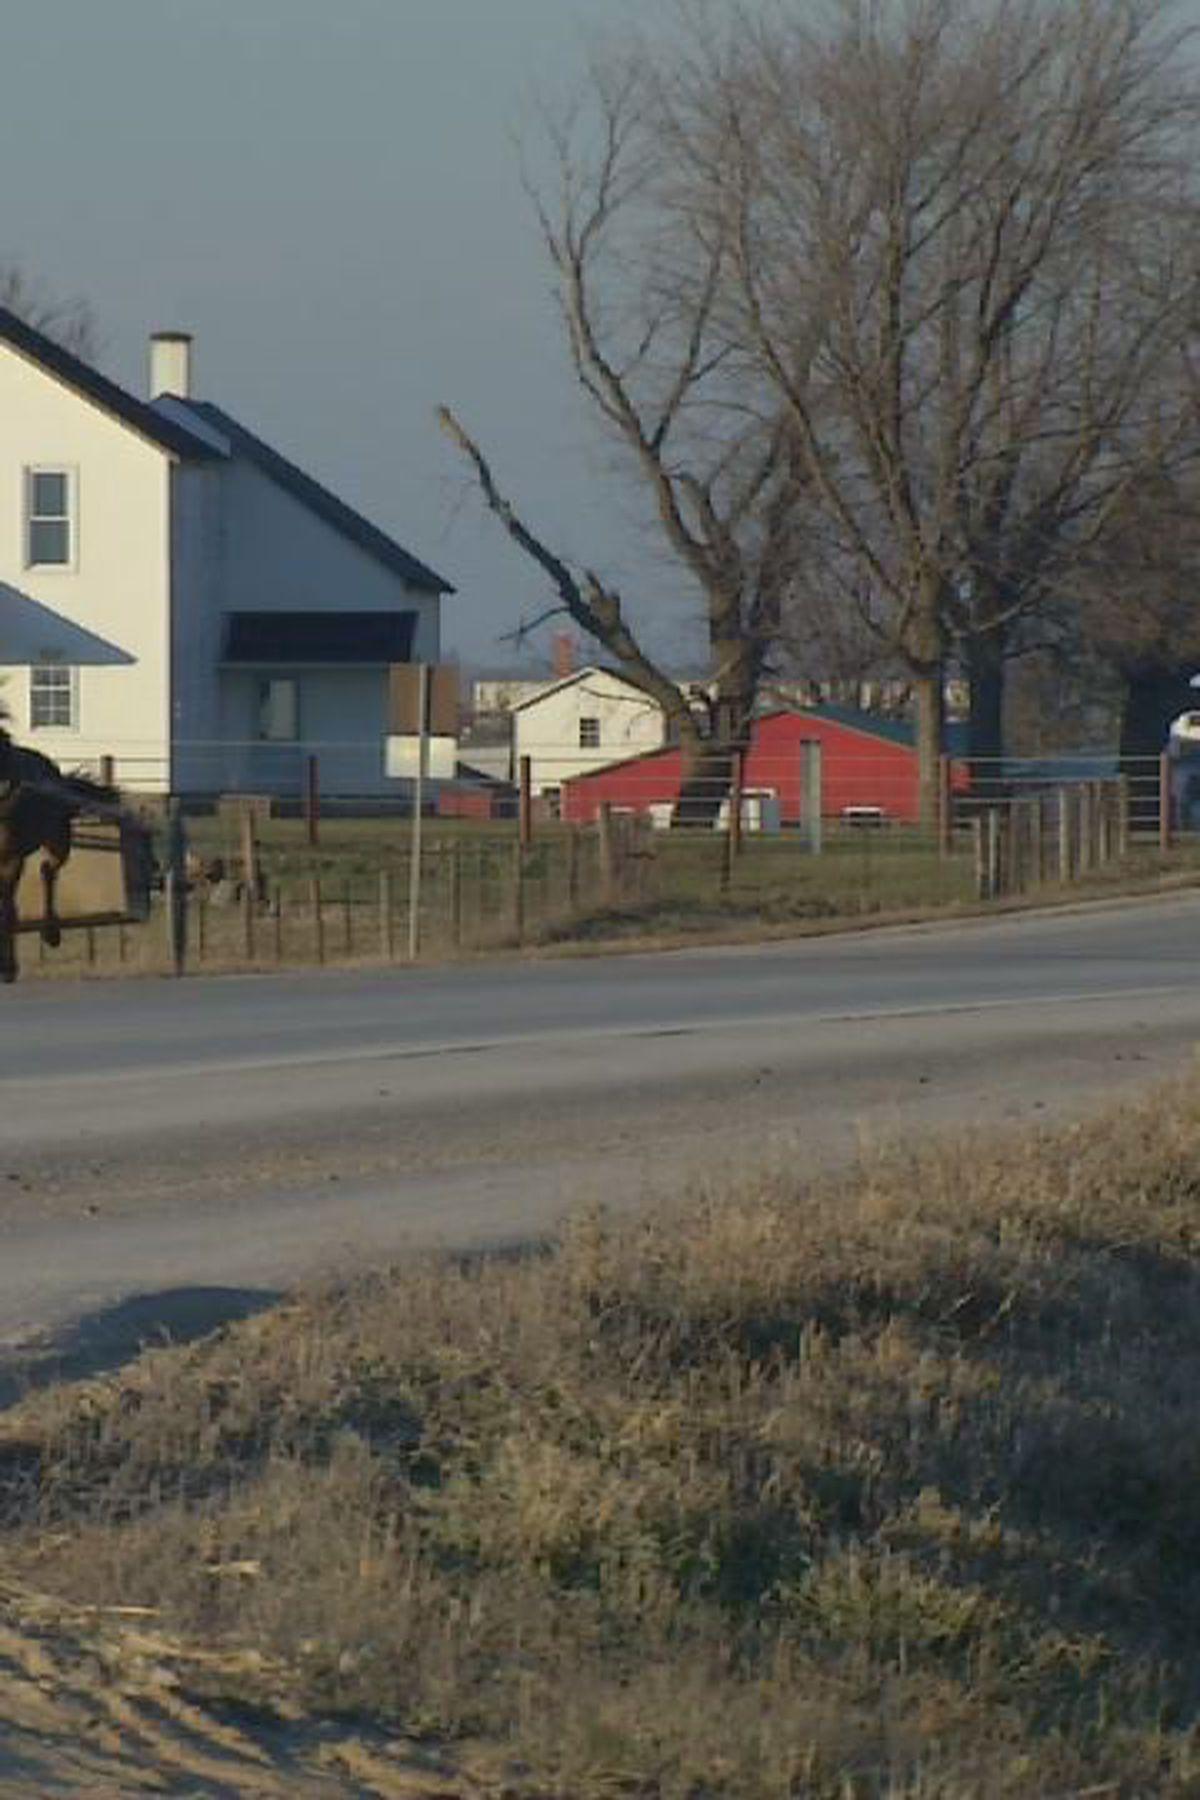 Amish Community Talks Vehicle Safety After Weekend Crash